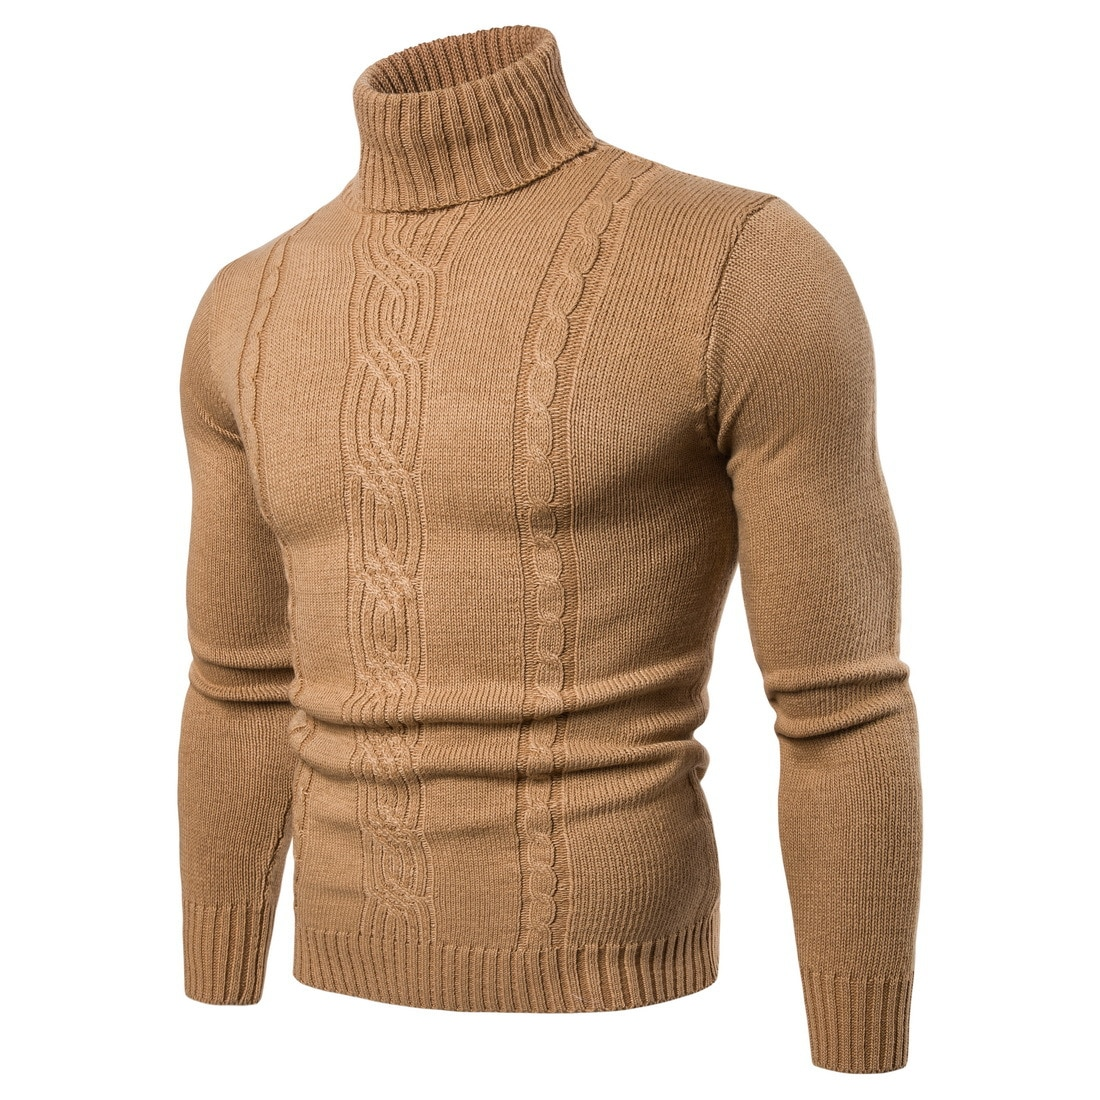 2019 Otoño Invierno jerseys de cuello alto para hombre suéter de punto informal cálido de manga larga camisa de fondo de tela masculina de talla grande 2XL